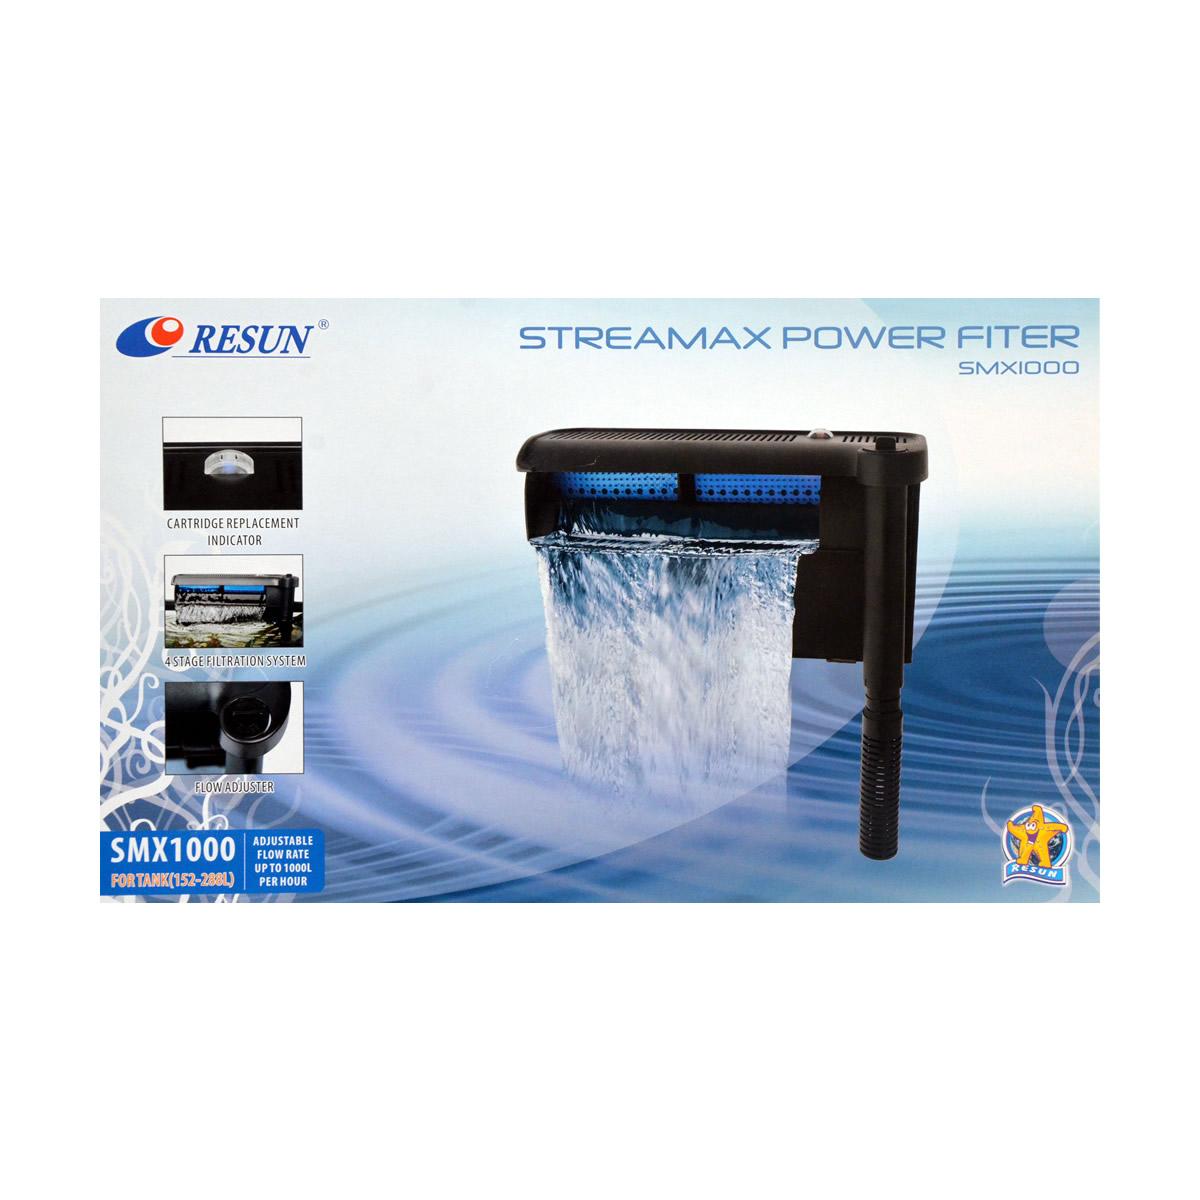 ReSun SMX1000 Streamax Hang On Power Filter 7W 1000L/H 152-288L